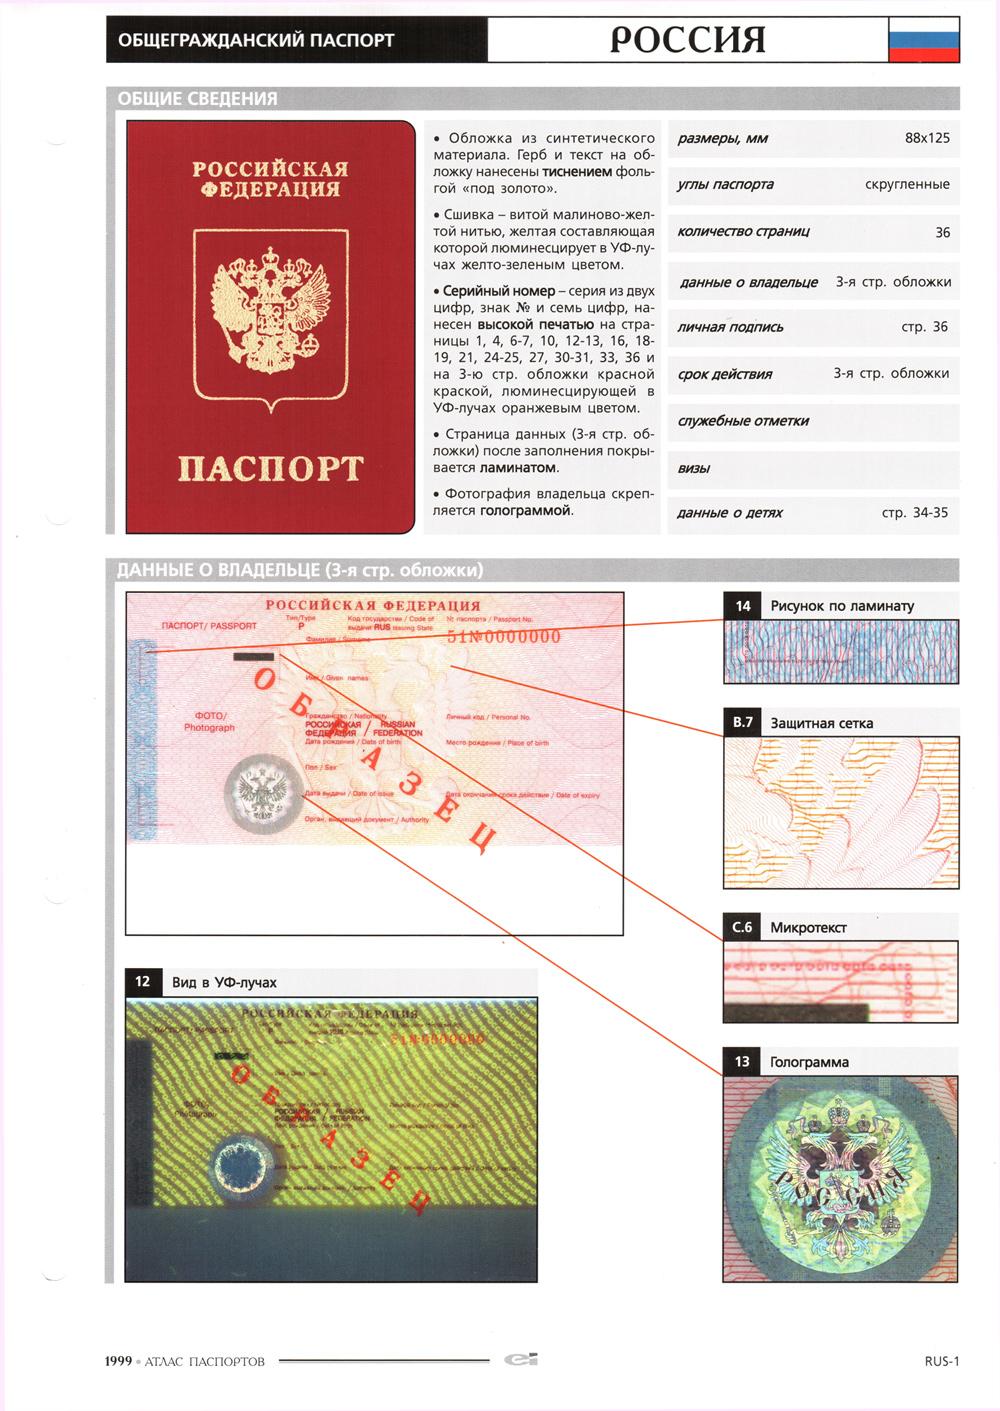 УФМС напоминает: загранпаспорт можно оформить через 29